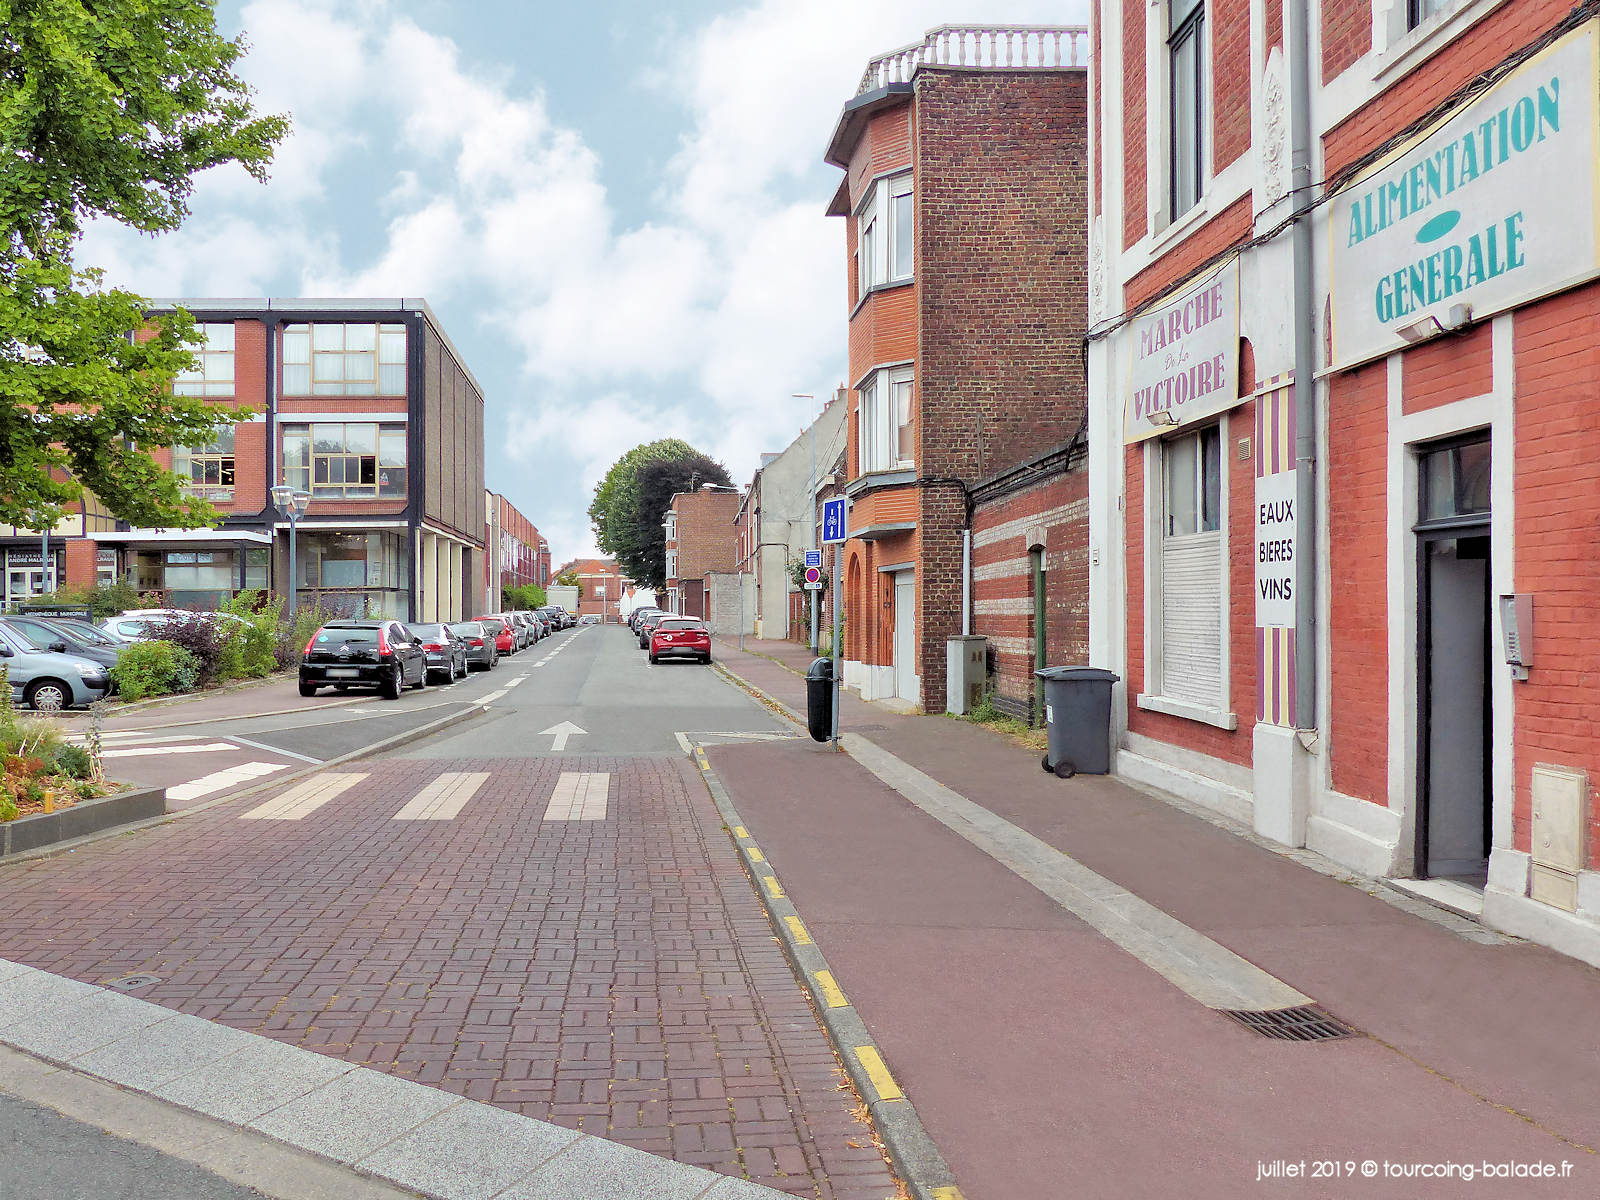 Rue Famelart, Tourcoing - Haut de la rue